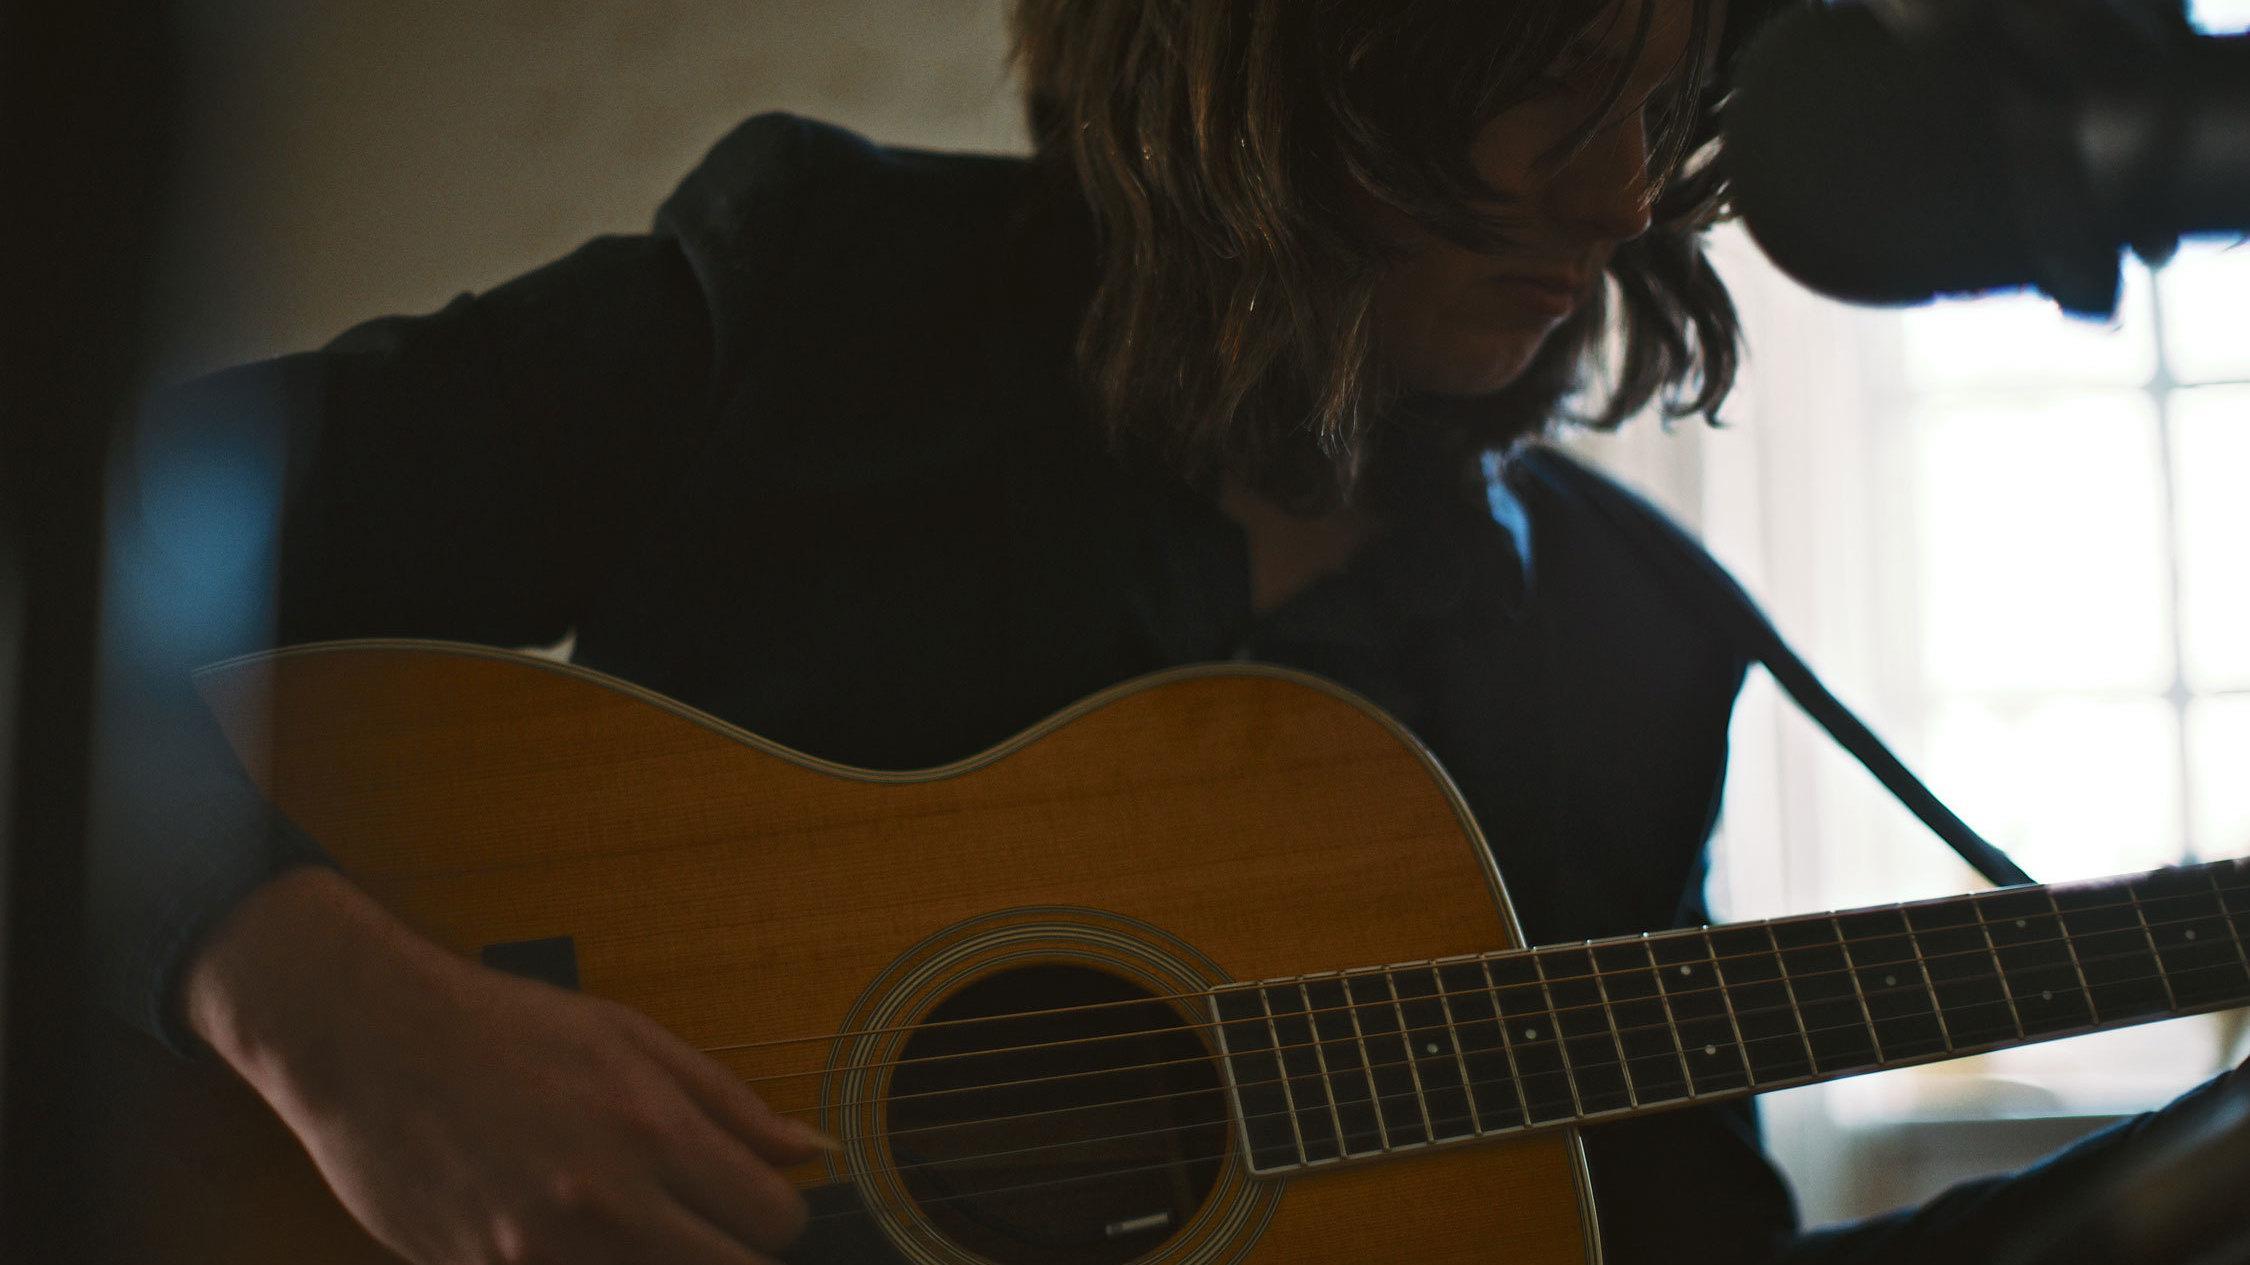 Zachary Cale's Meditative Solo Guitar Sounds Like Twilight Fading